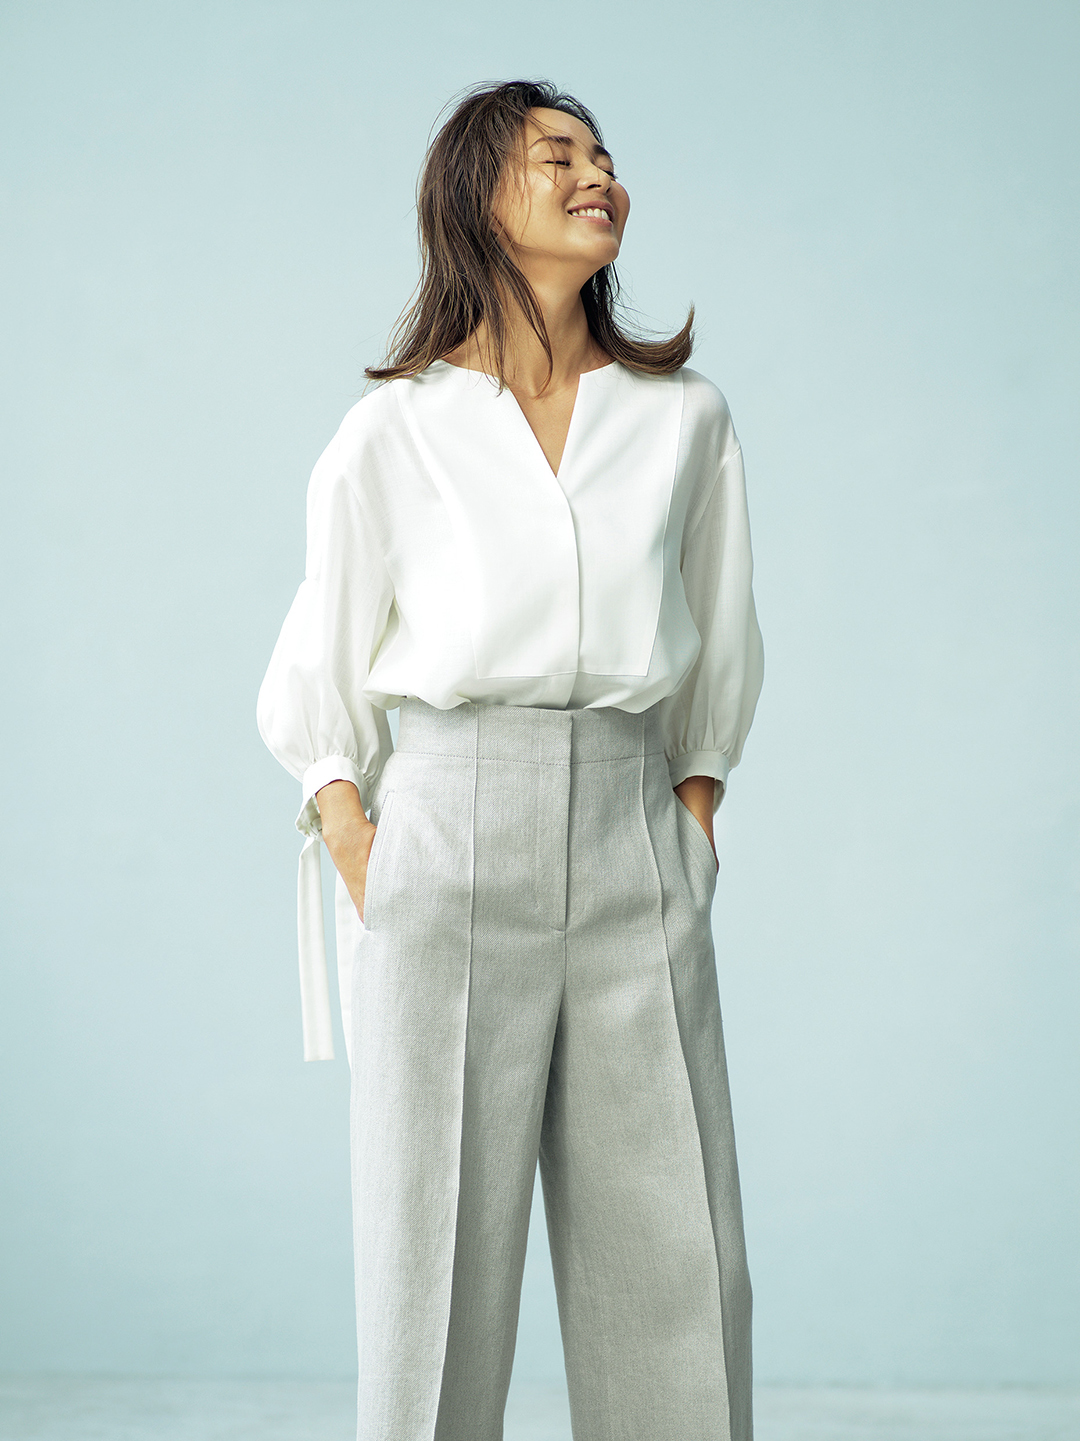 SHIHOが着るebureの自然体で着映える服_6